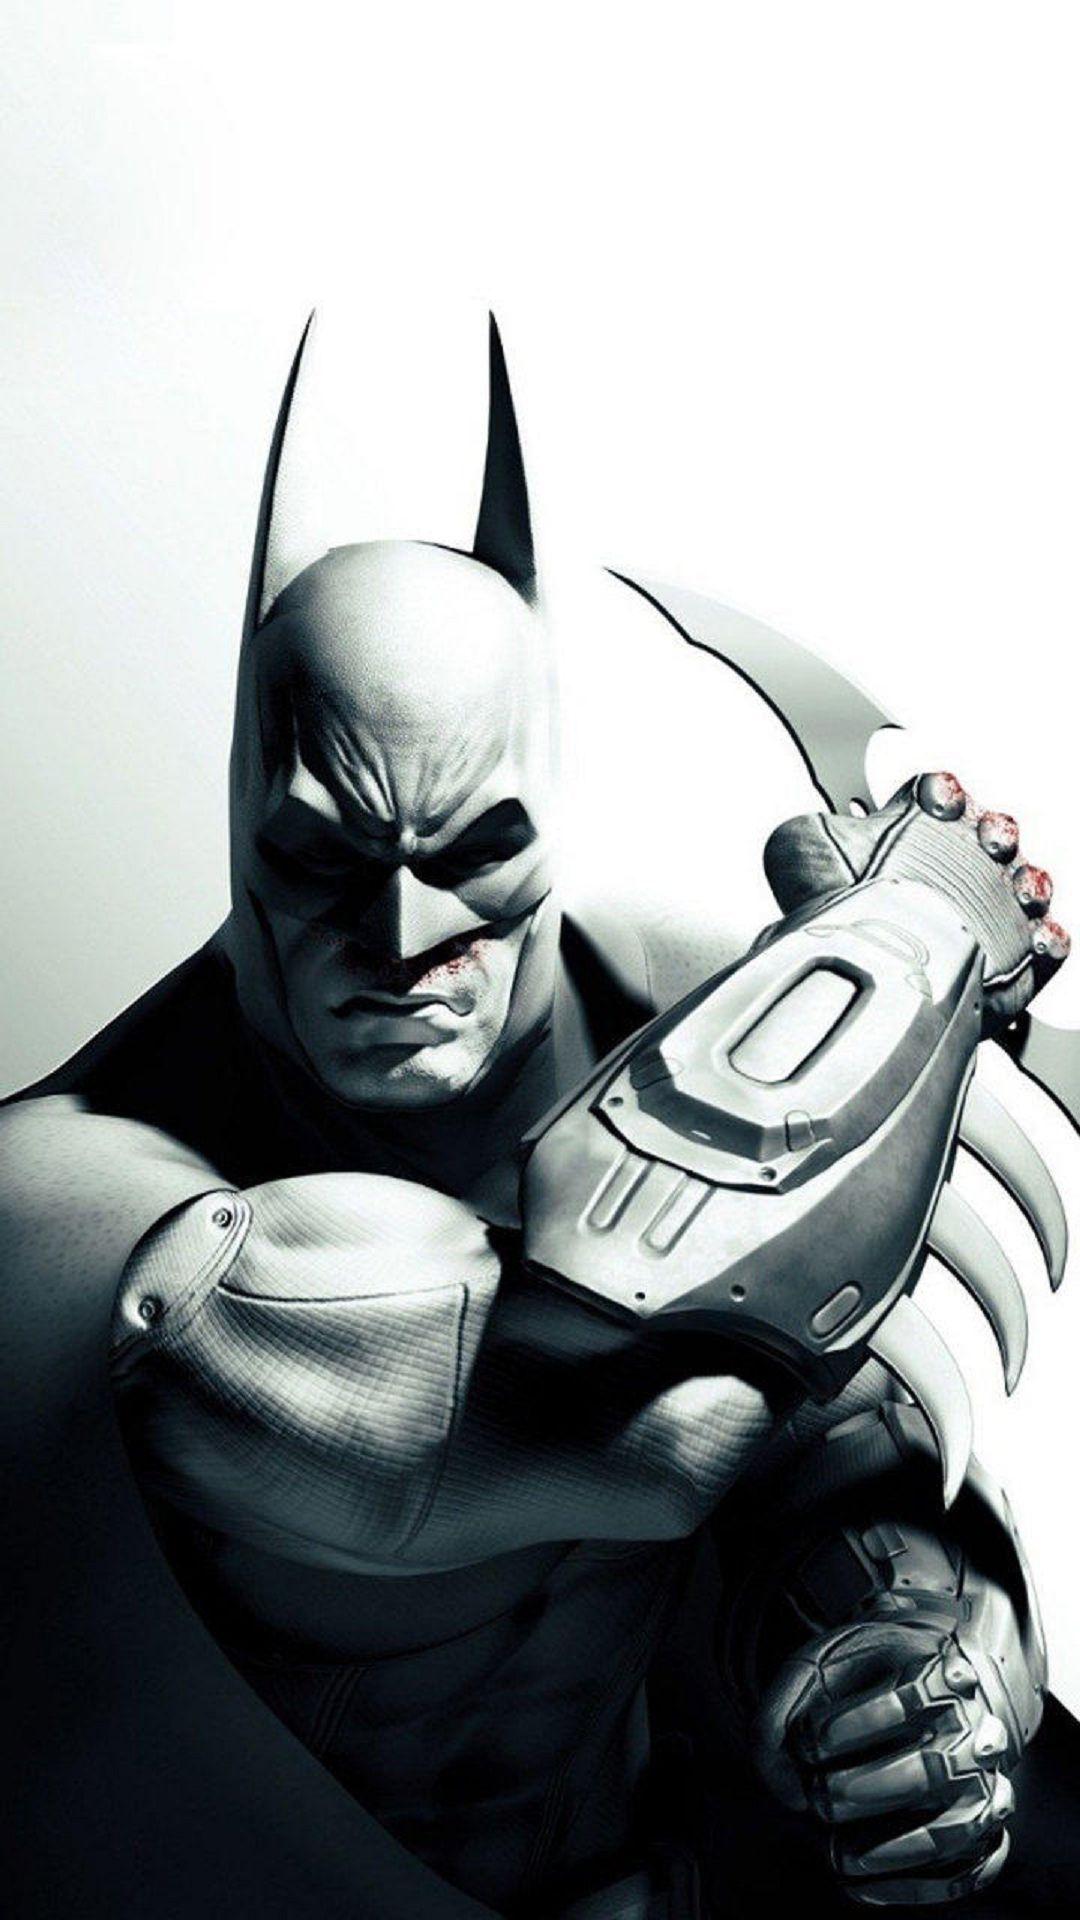 photos hd wallpapers batman iphone | batman | pinterest | batman, hd